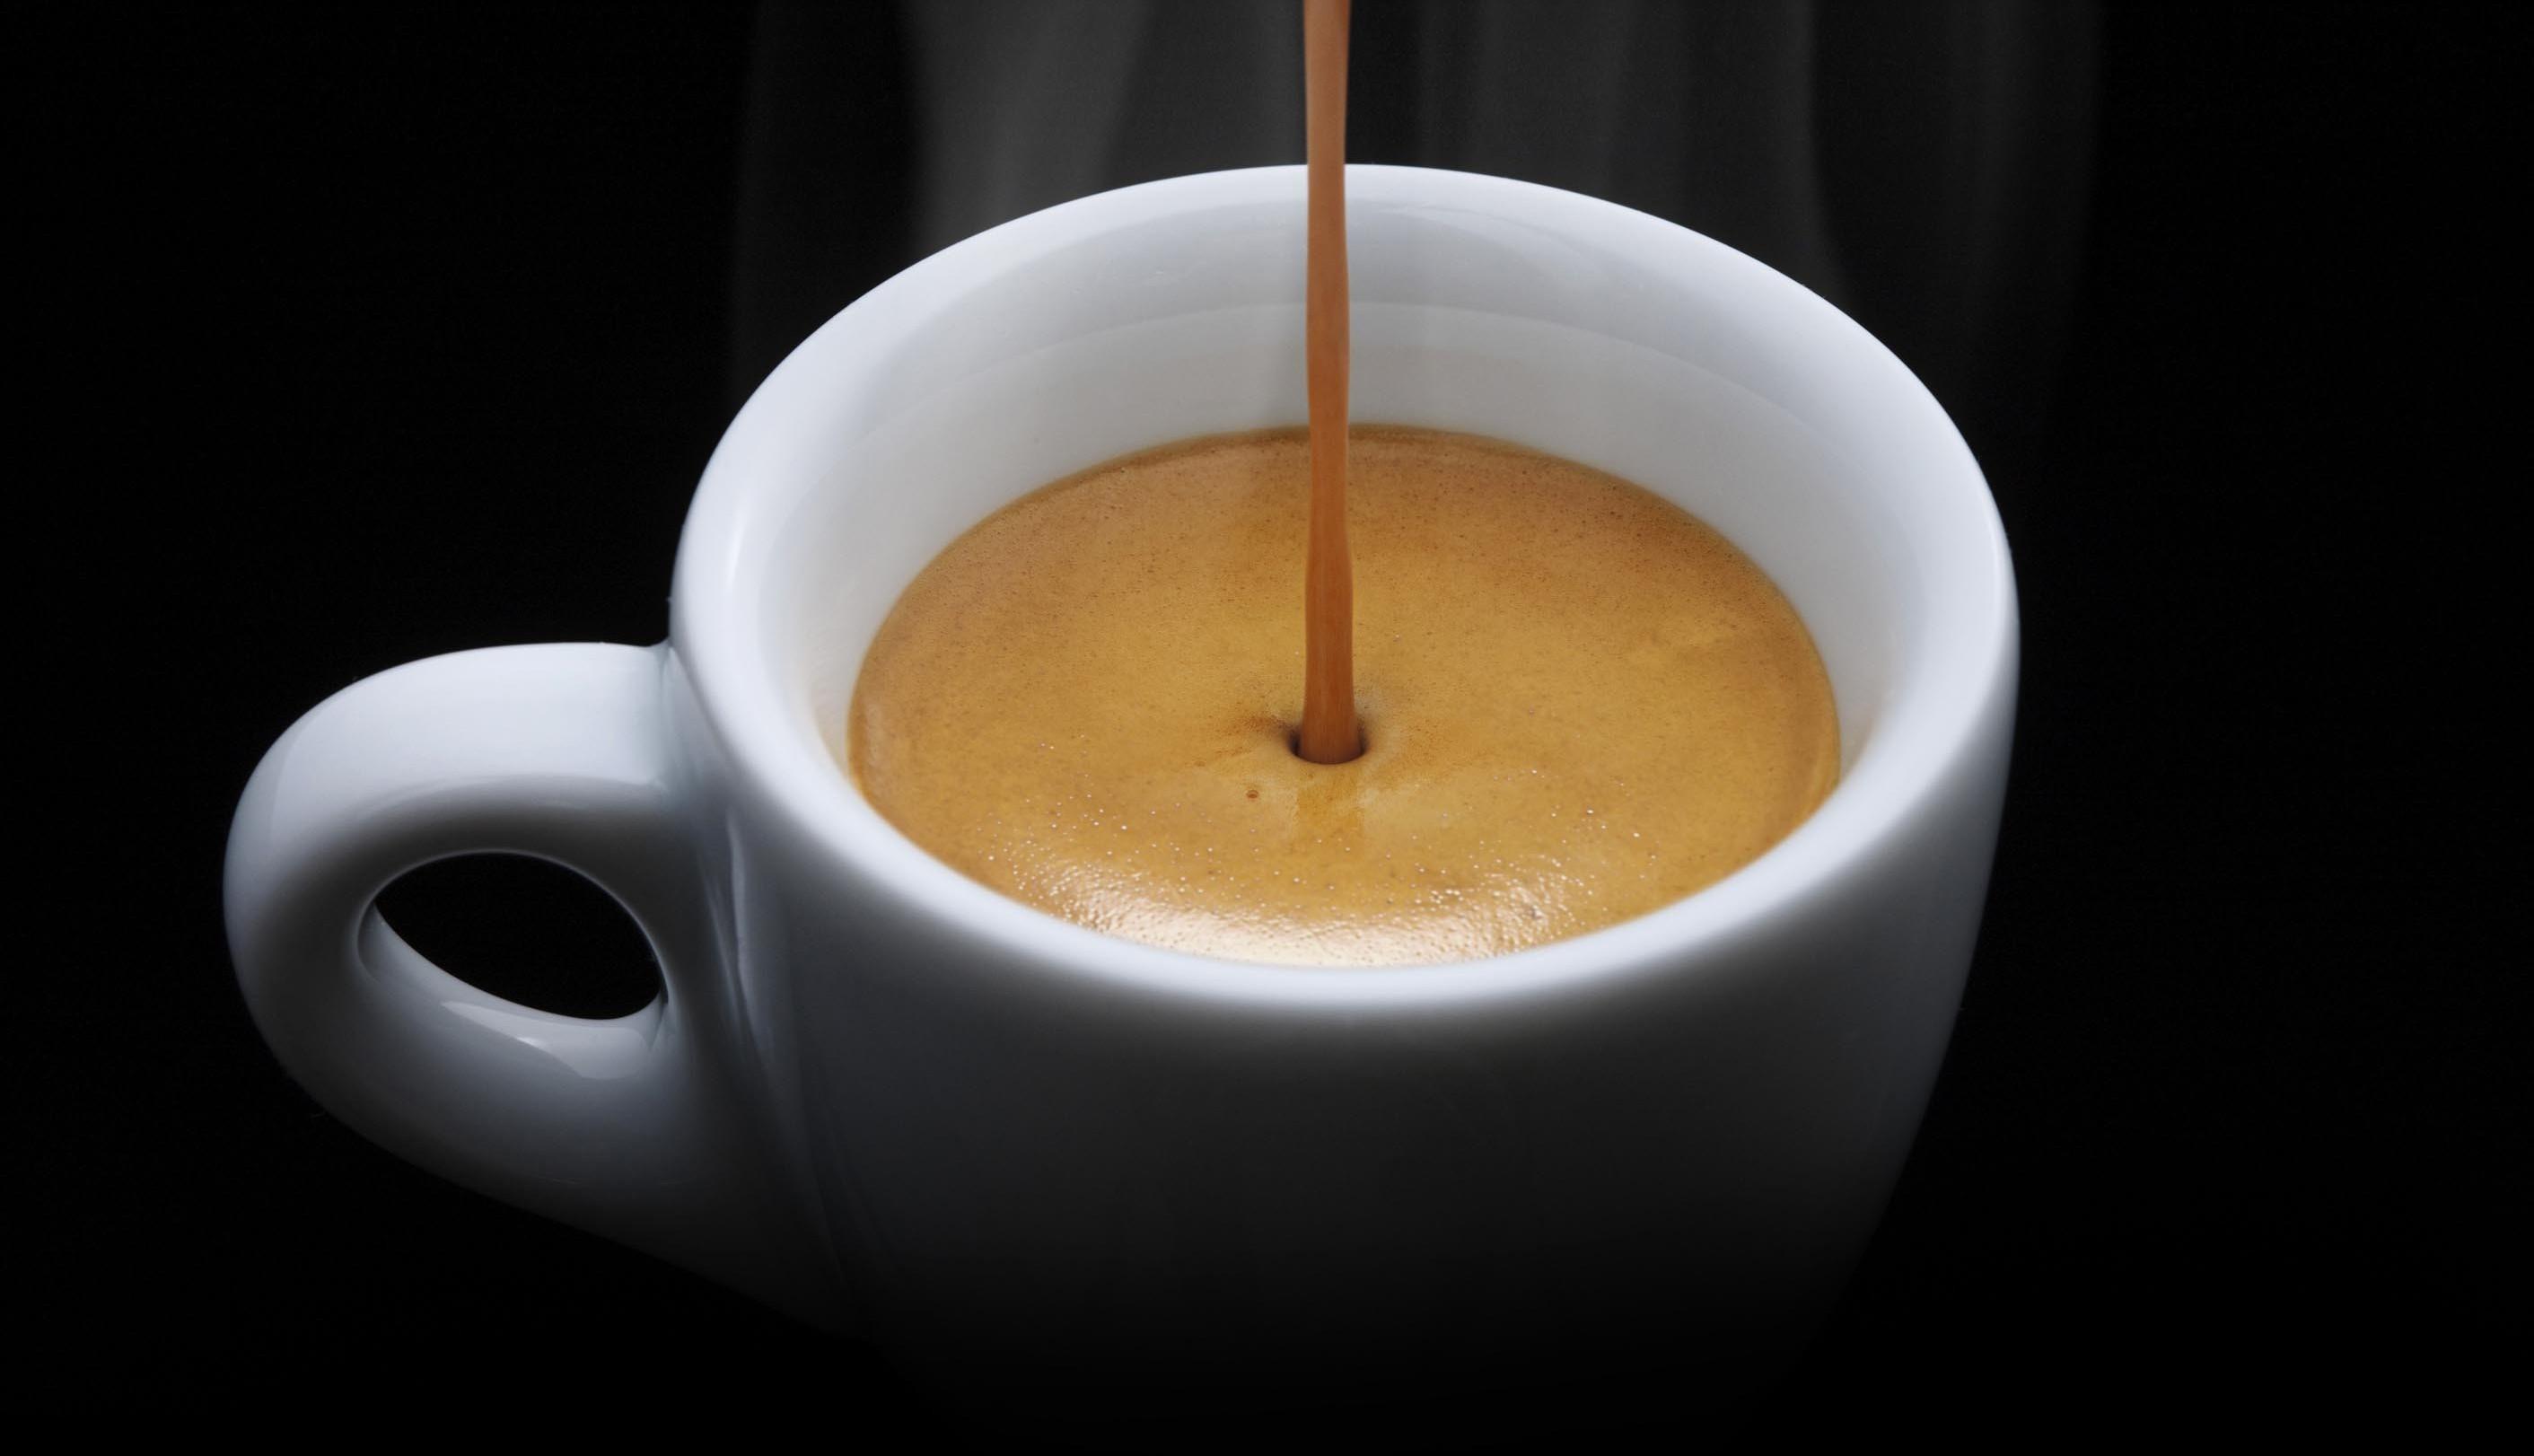 5 стимулирующих фактов о кофеине